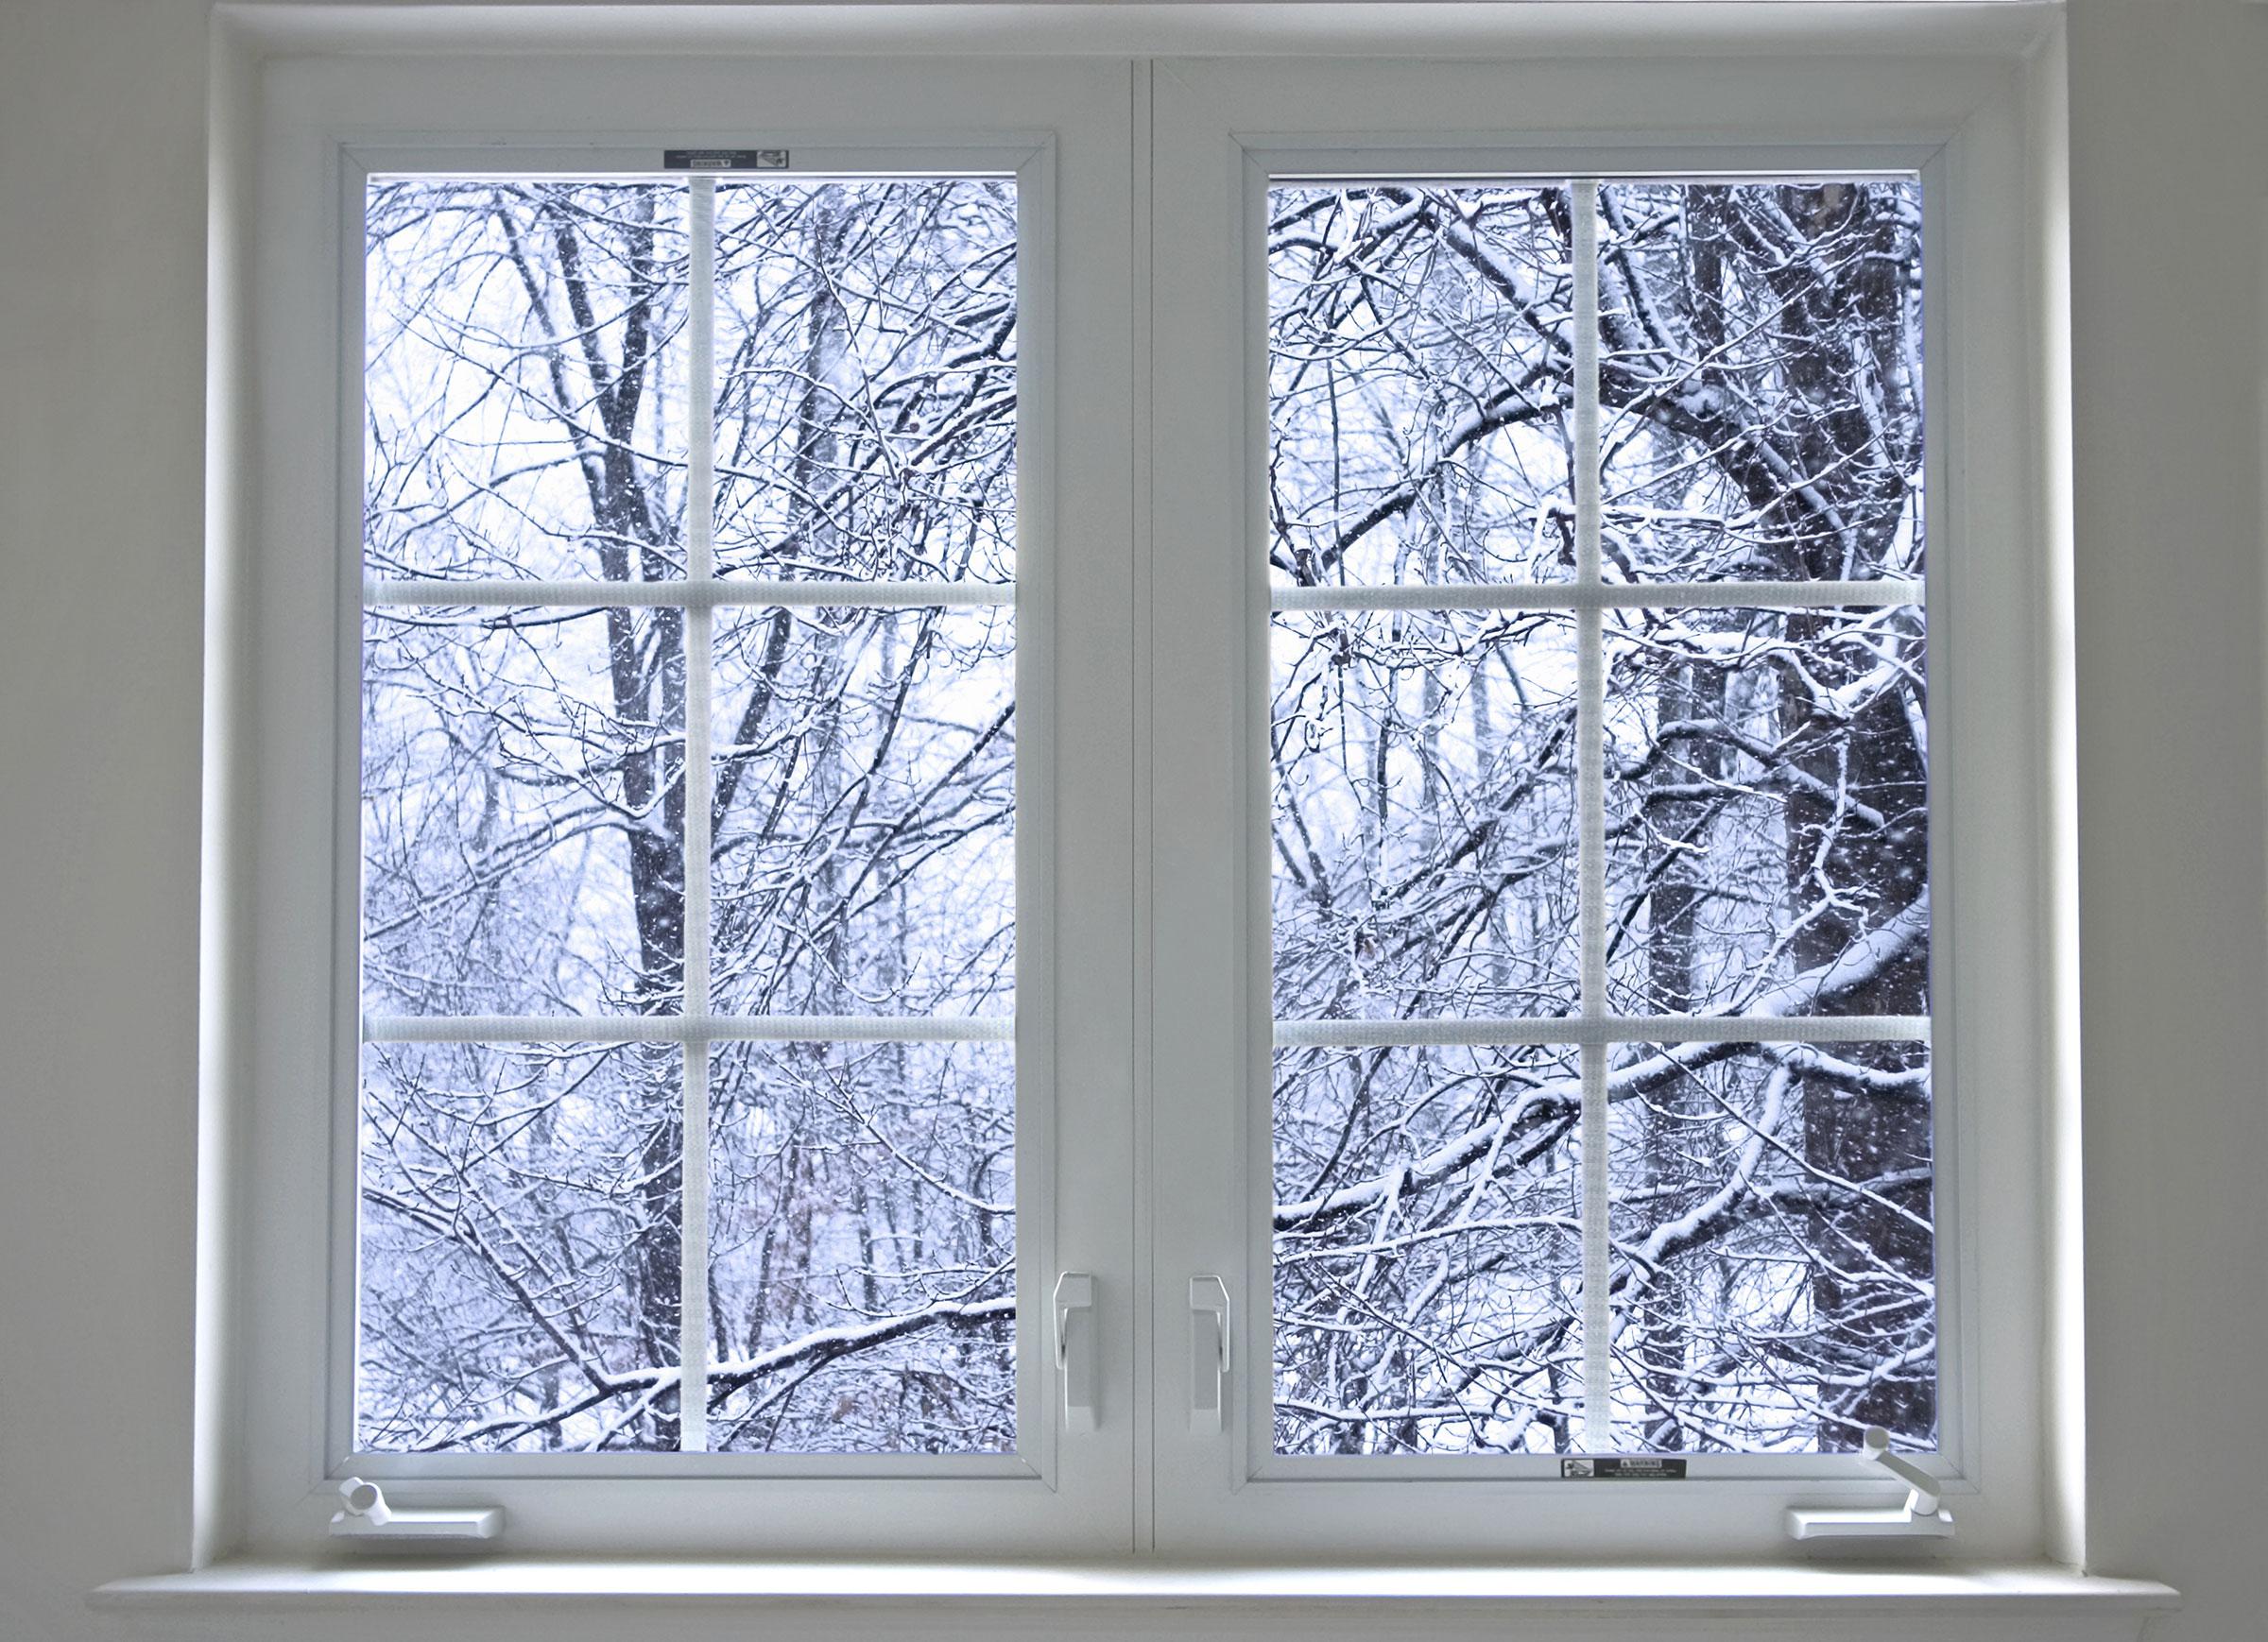 Snowy window (https://gordonswindowdecor.com/wp-content/uploads/sites/23/2012/07/needsheat_snowy.jpg)